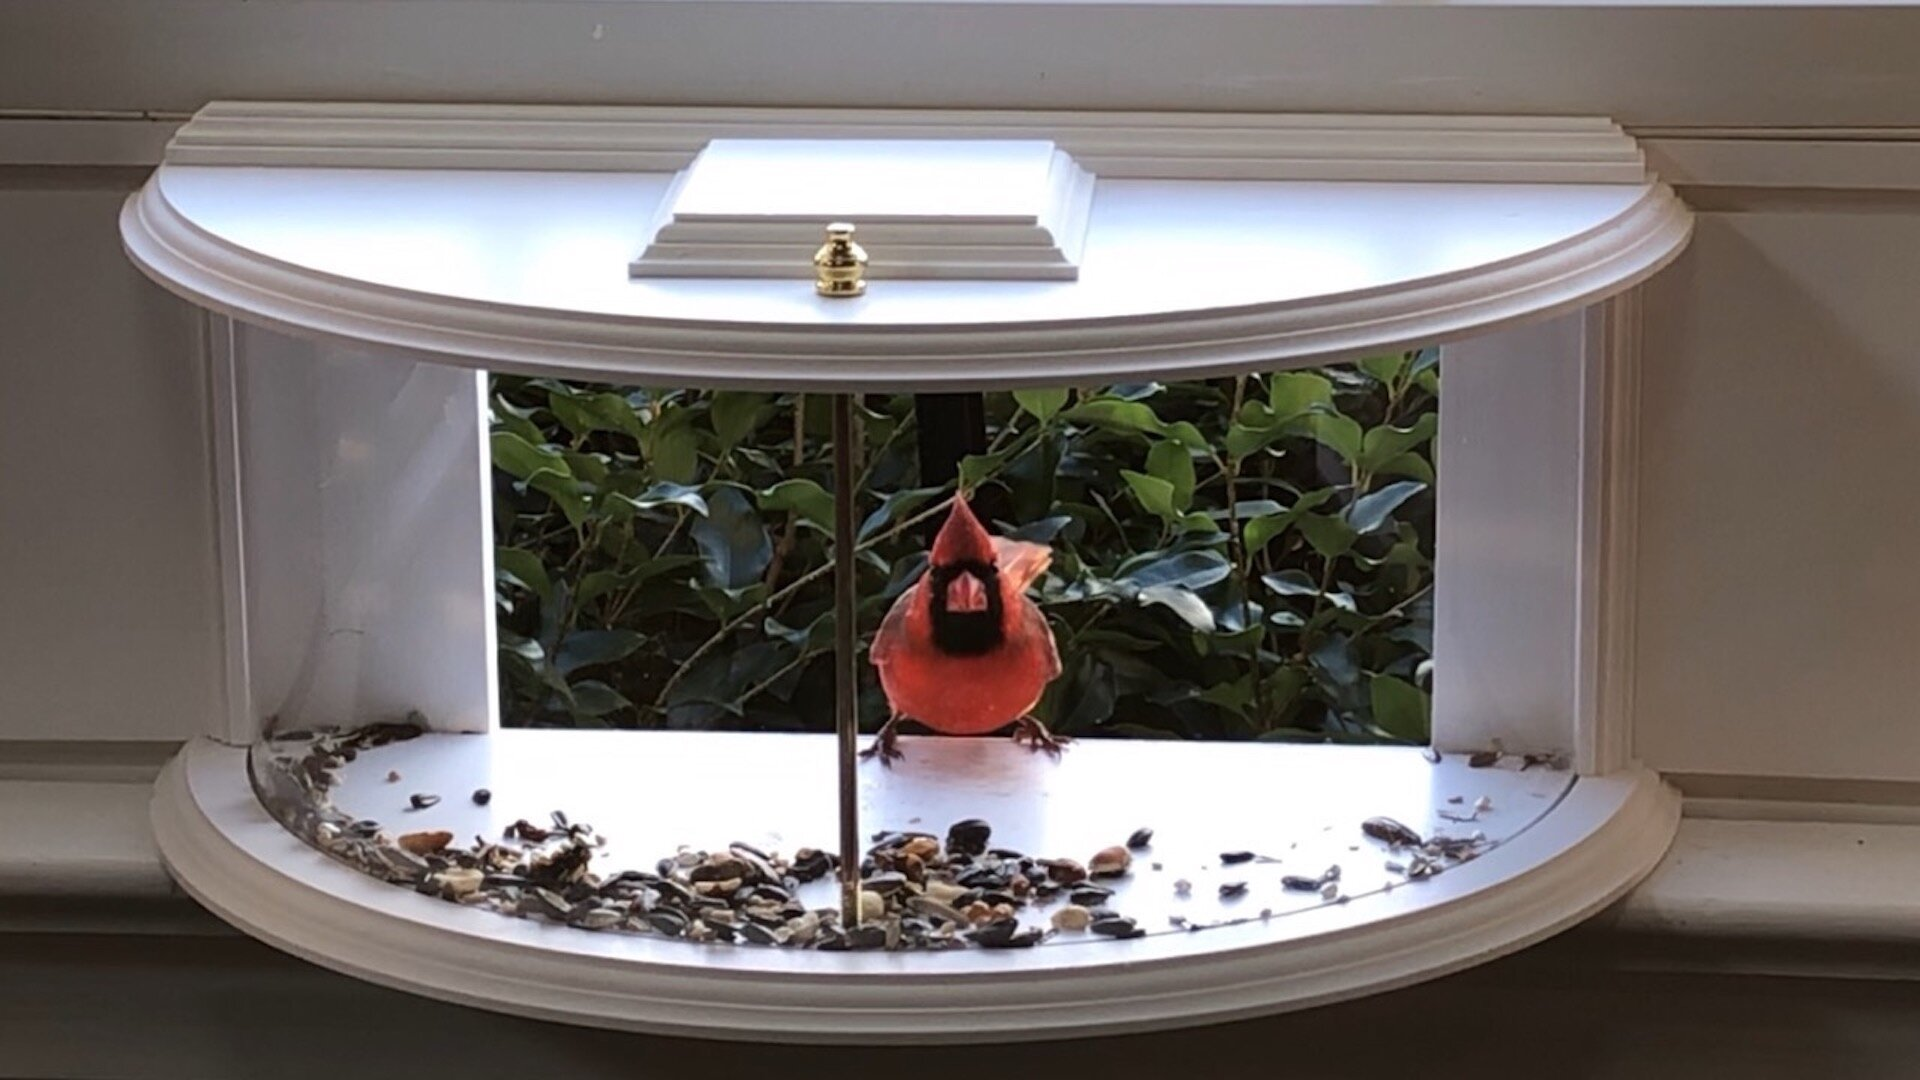 Arlmont Co Krick View Window Tray Bird Feeder Reviews Wayfair